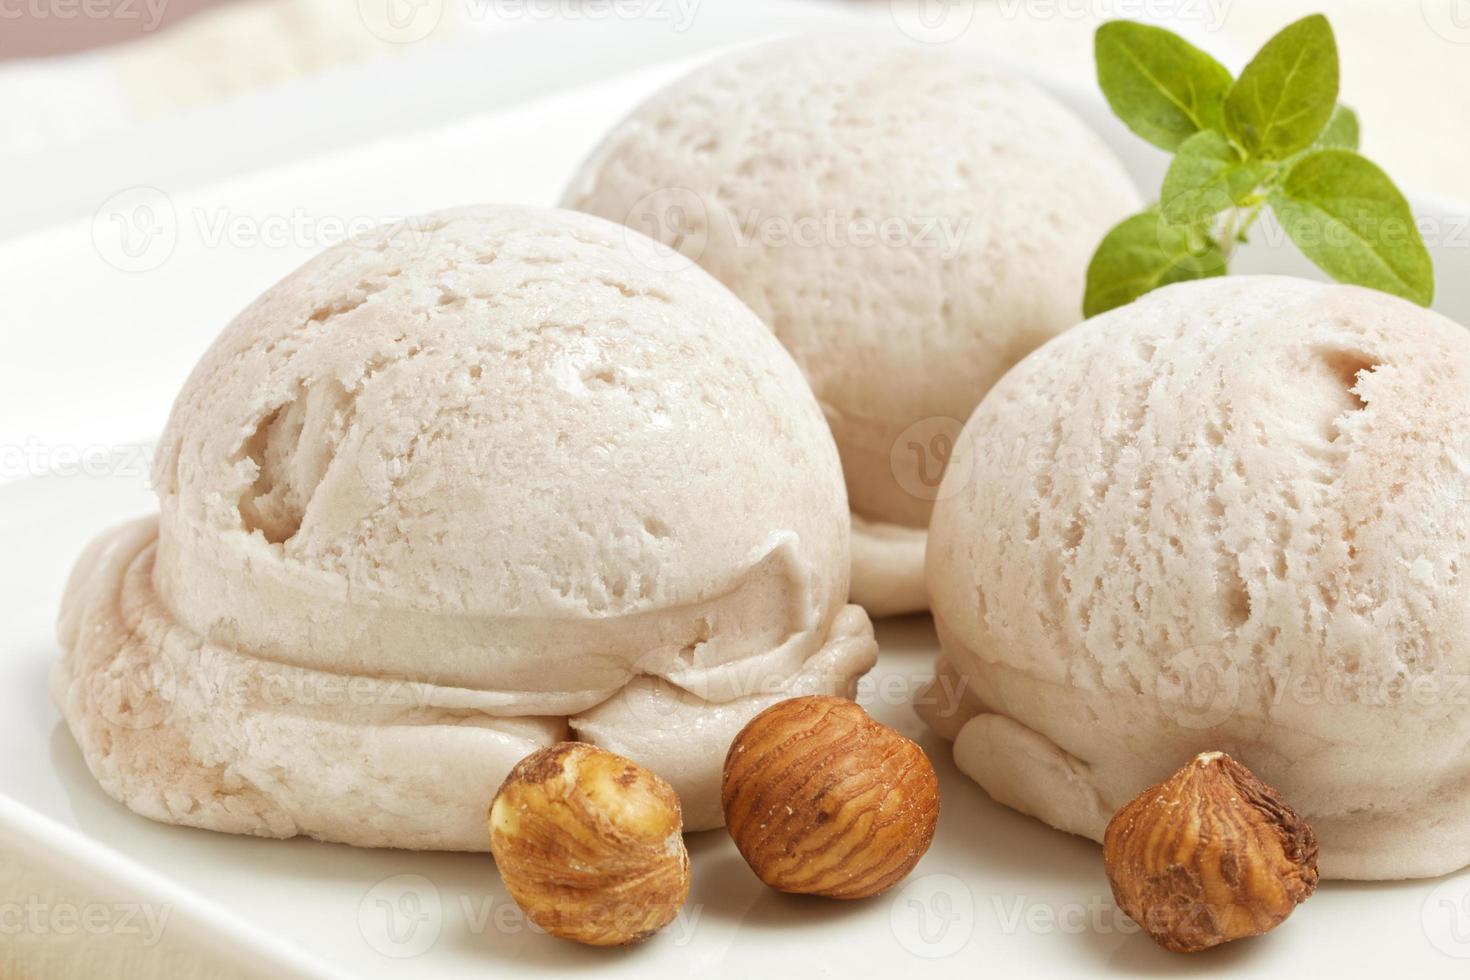 gelato artigianale alla nocciola foto